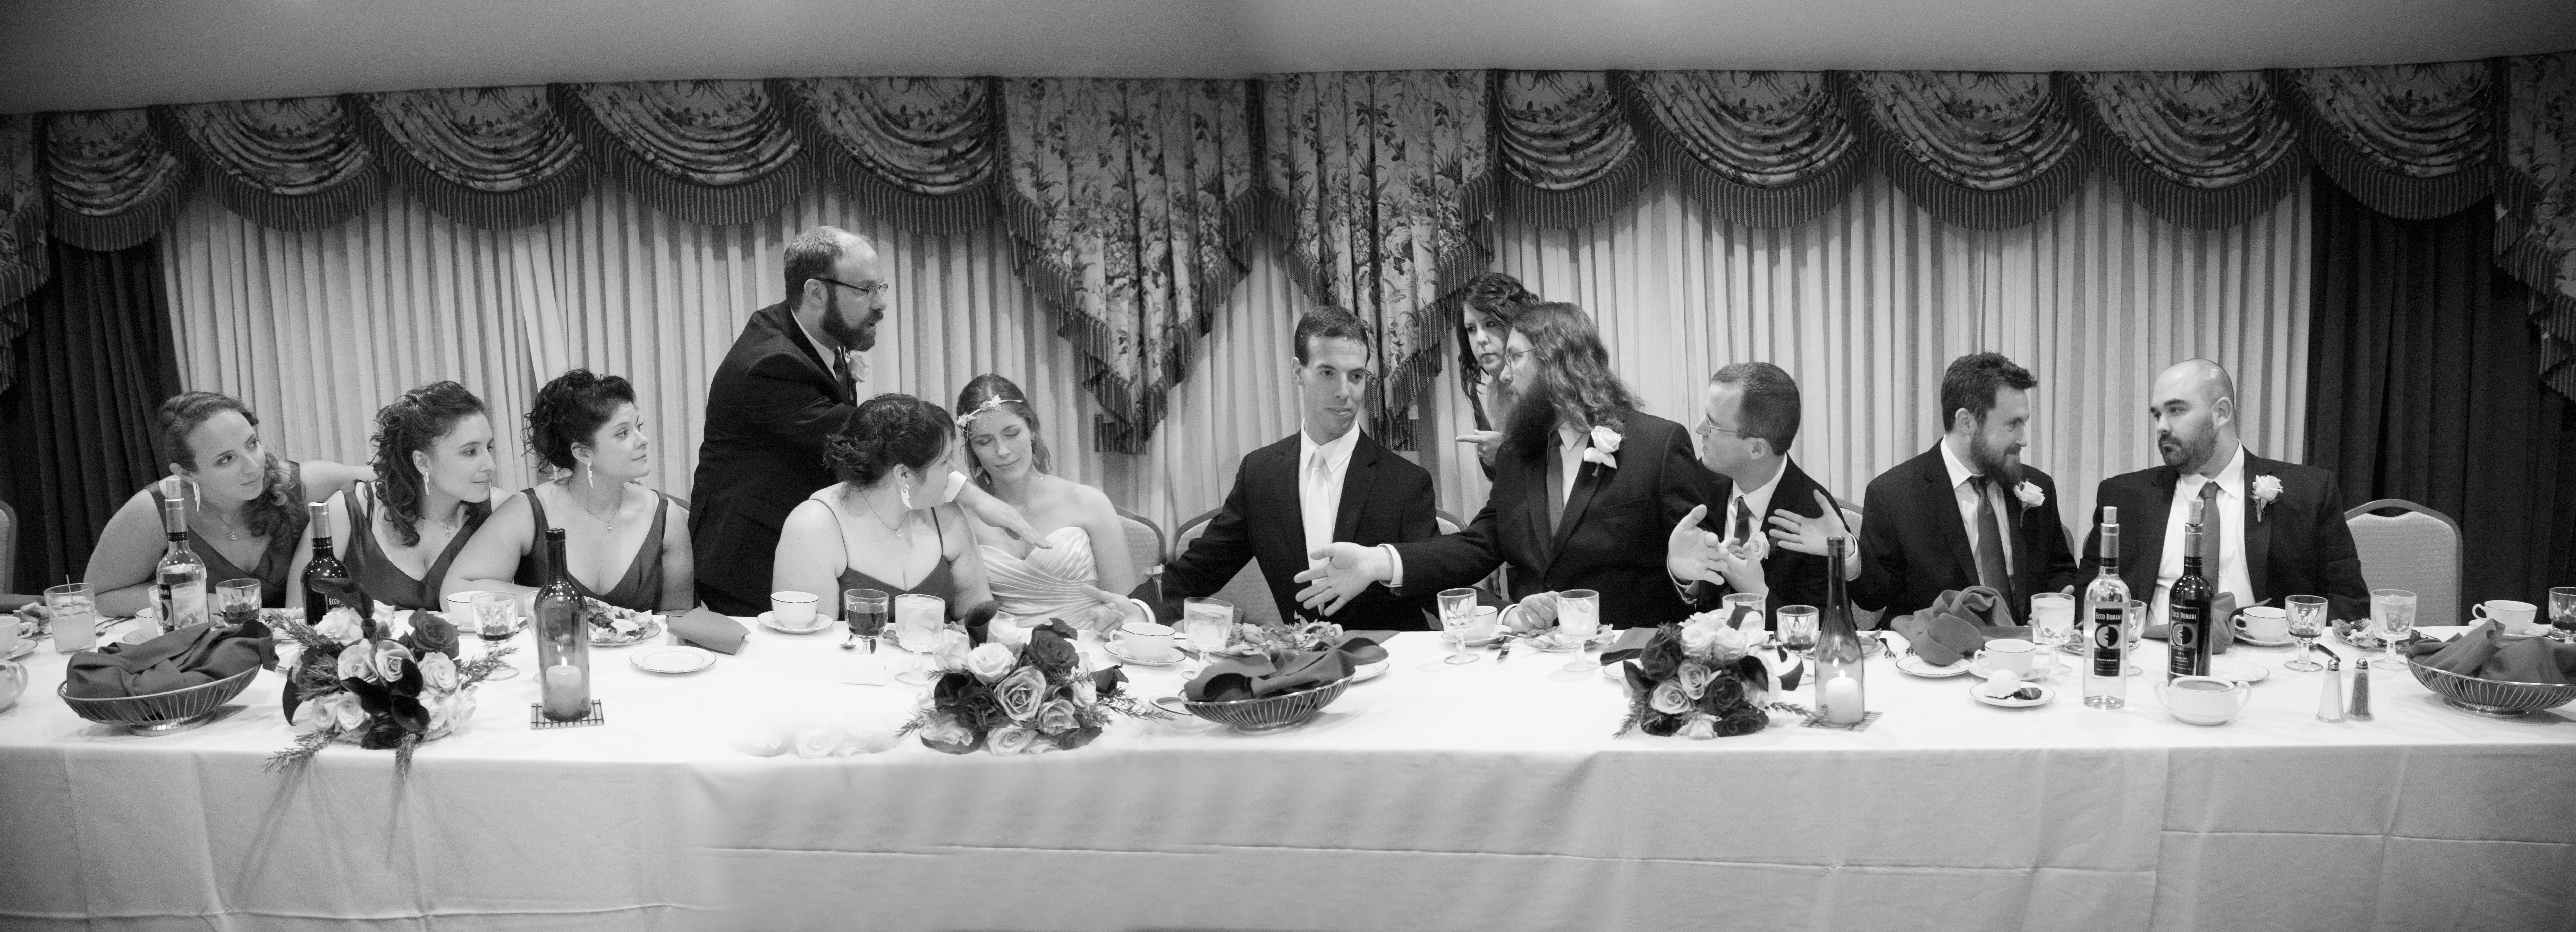 wedding party reenacts leonardo da vinci u0027s u0027last supper u0027 painting